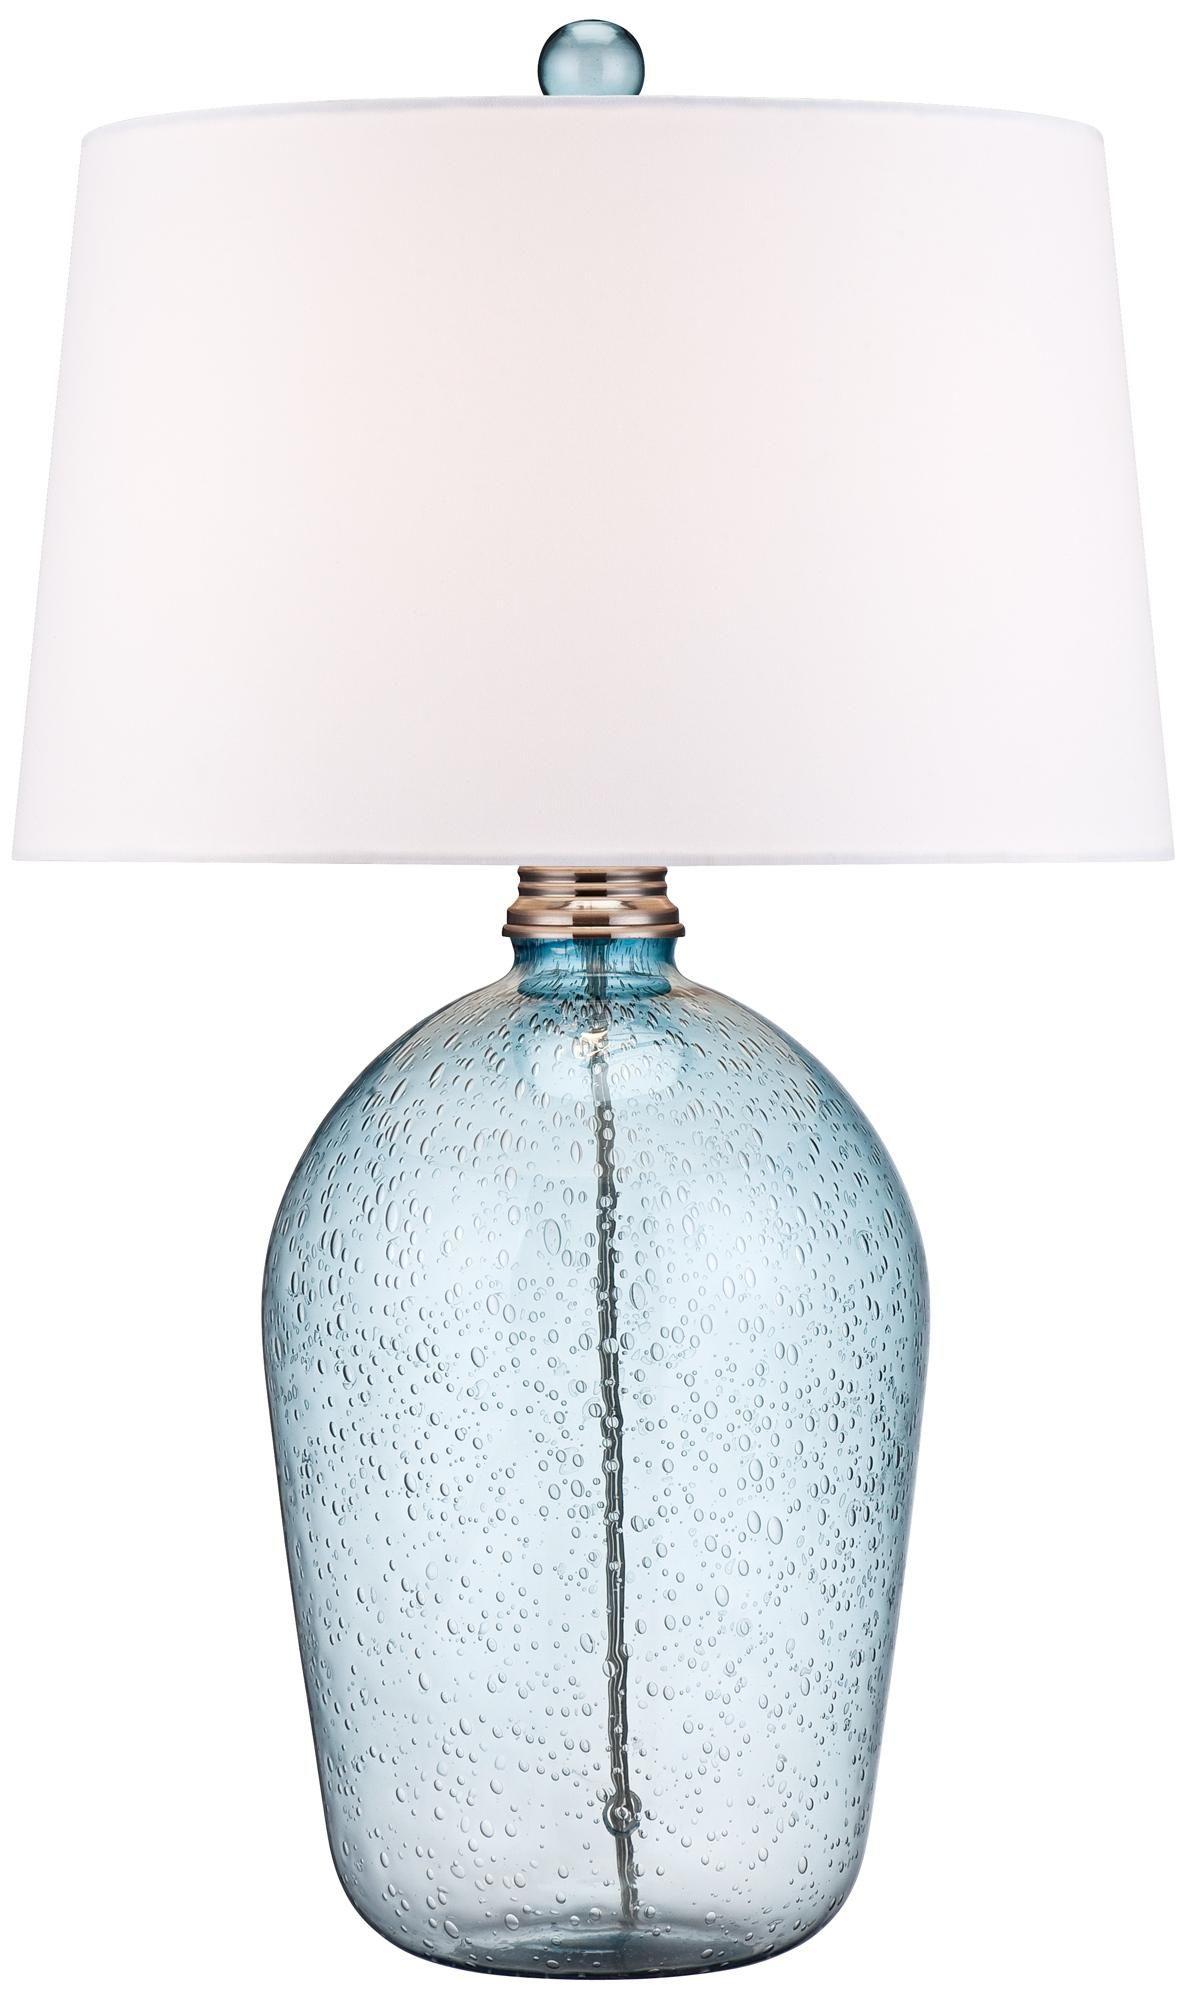 Hand Blown Blue Bubble Glass Table Lamp W6758 Lamps Plus Glass Table Lamp Blue Glass Lamp Lamp